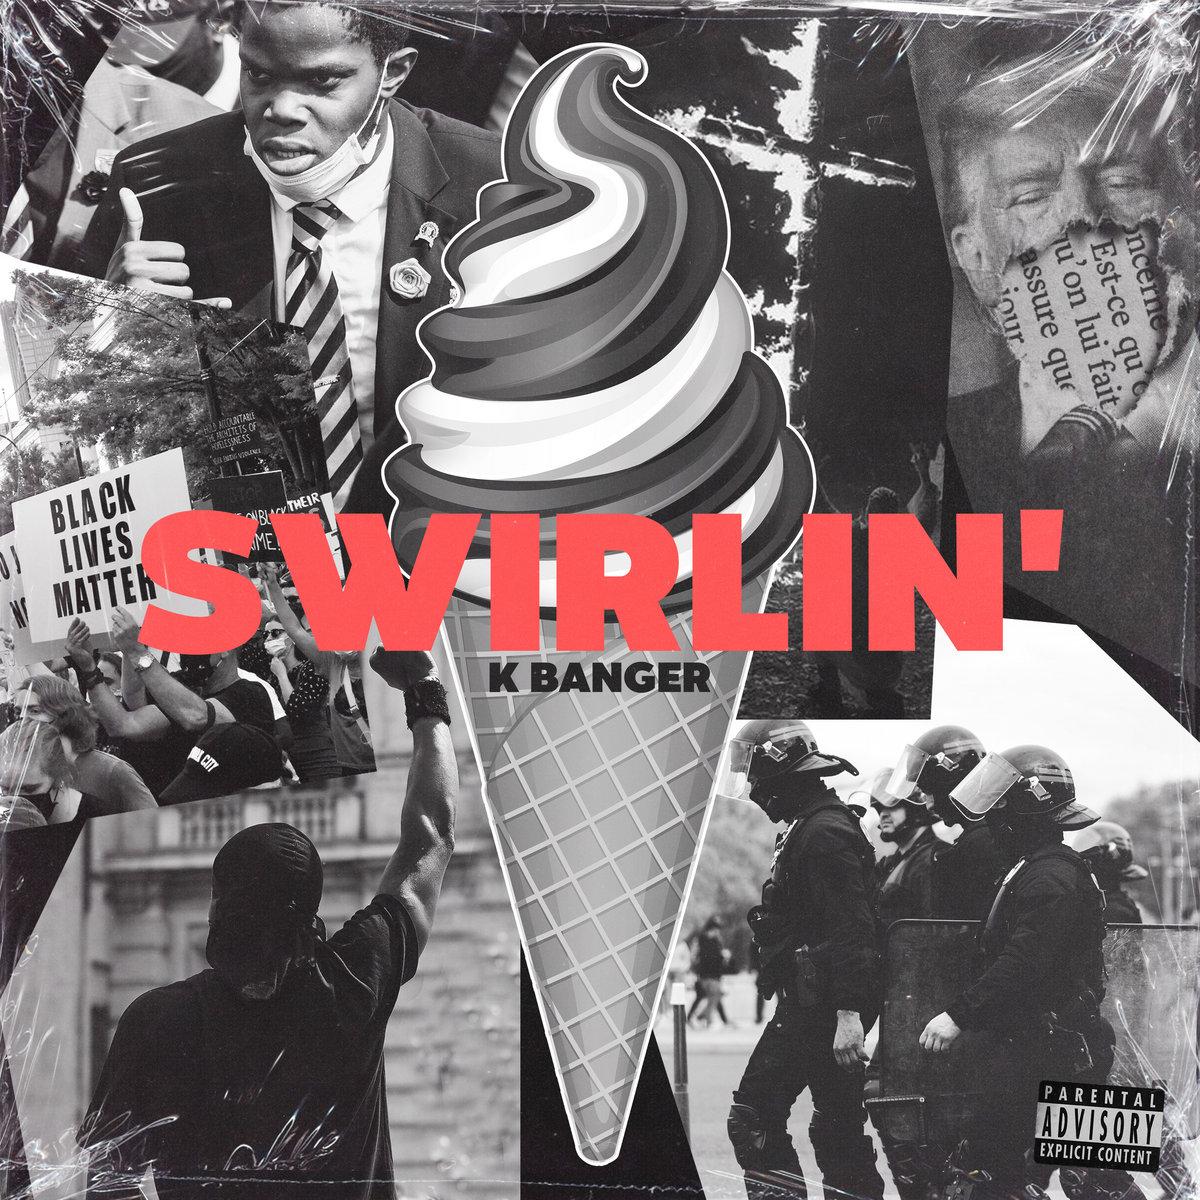 Swirlin' by K Banger